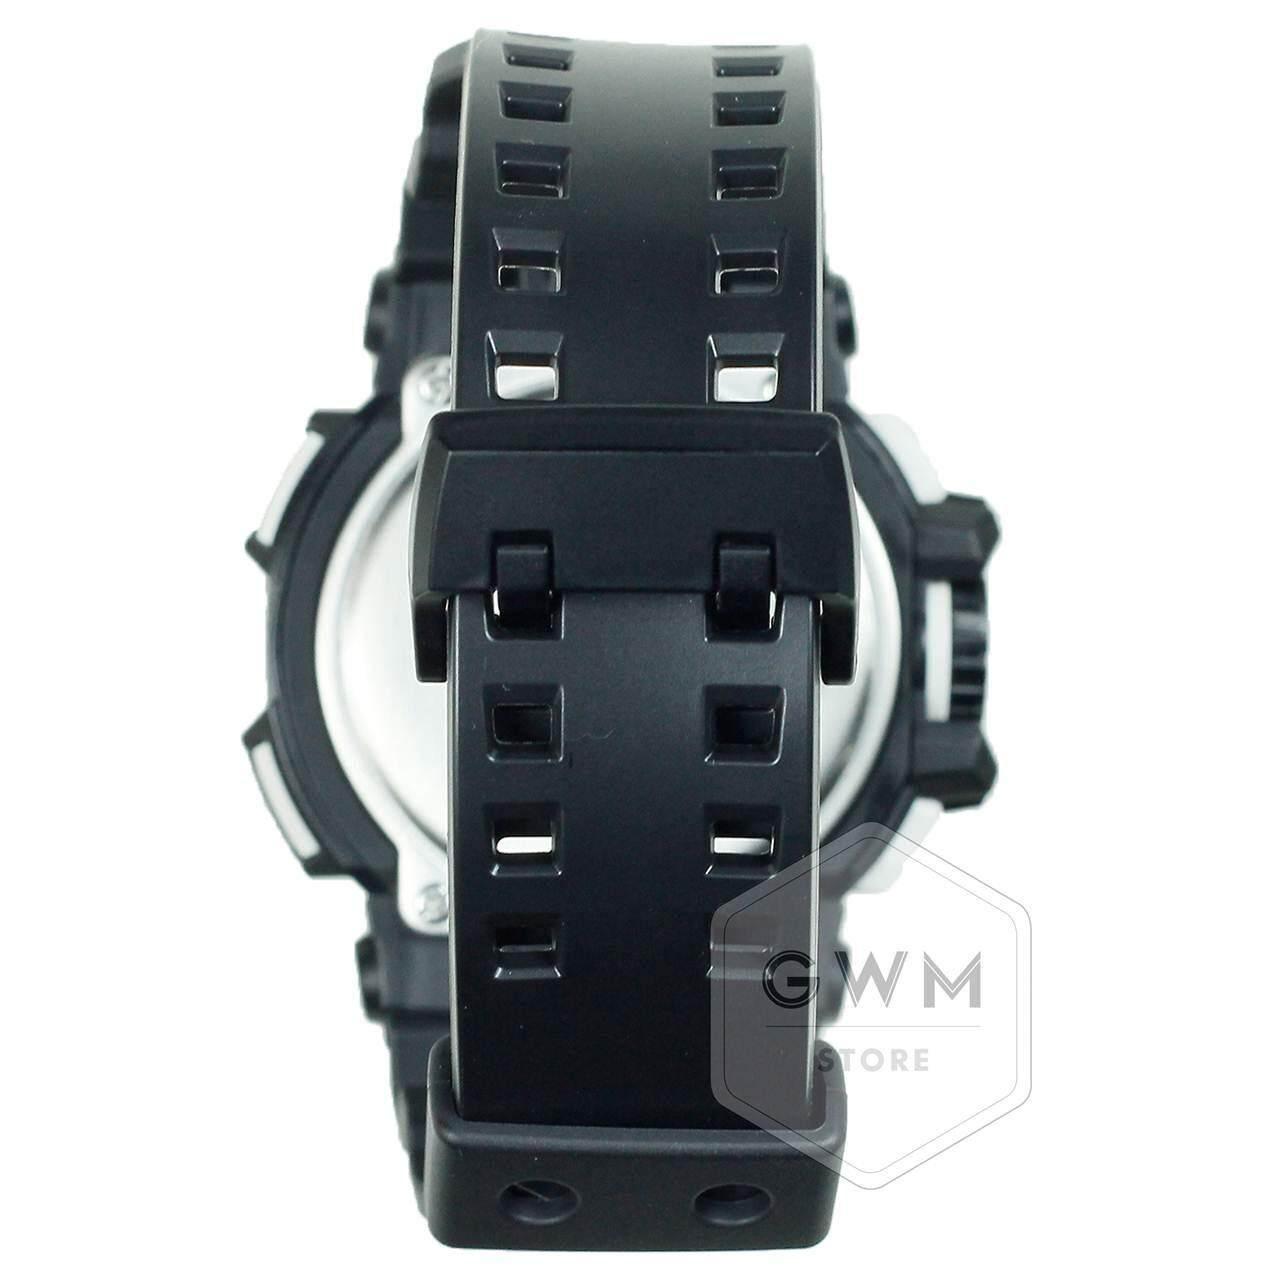 Fitur Casio Digital Analog Watch G Shock Ga 400 Series Dan Harga 400hr 1adr Standard 1a 3